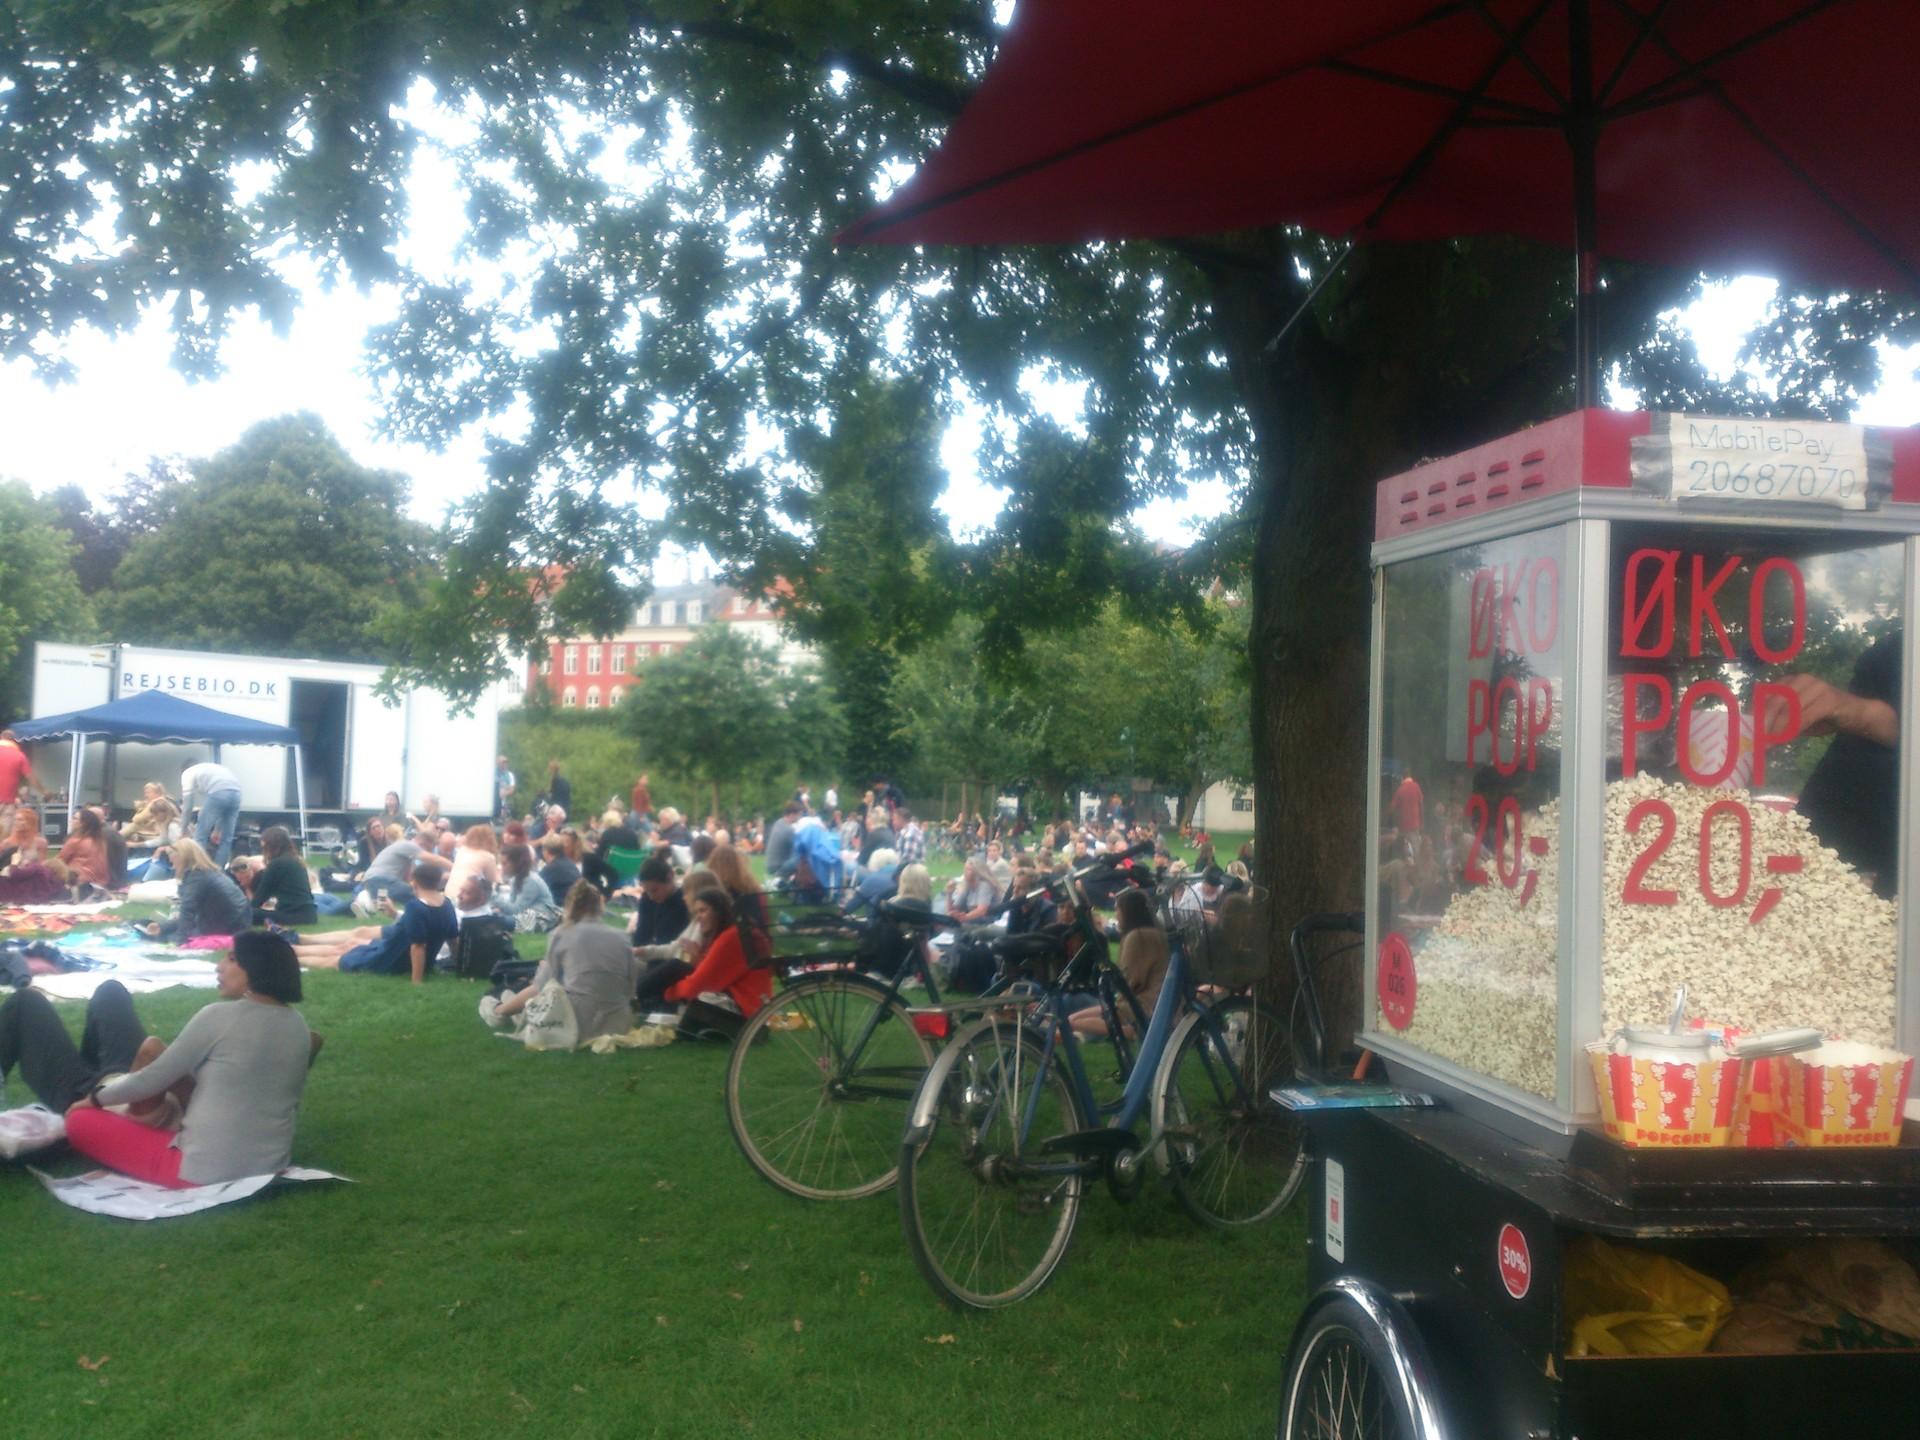 open-air-movie-copenhagen-78d235d298111c